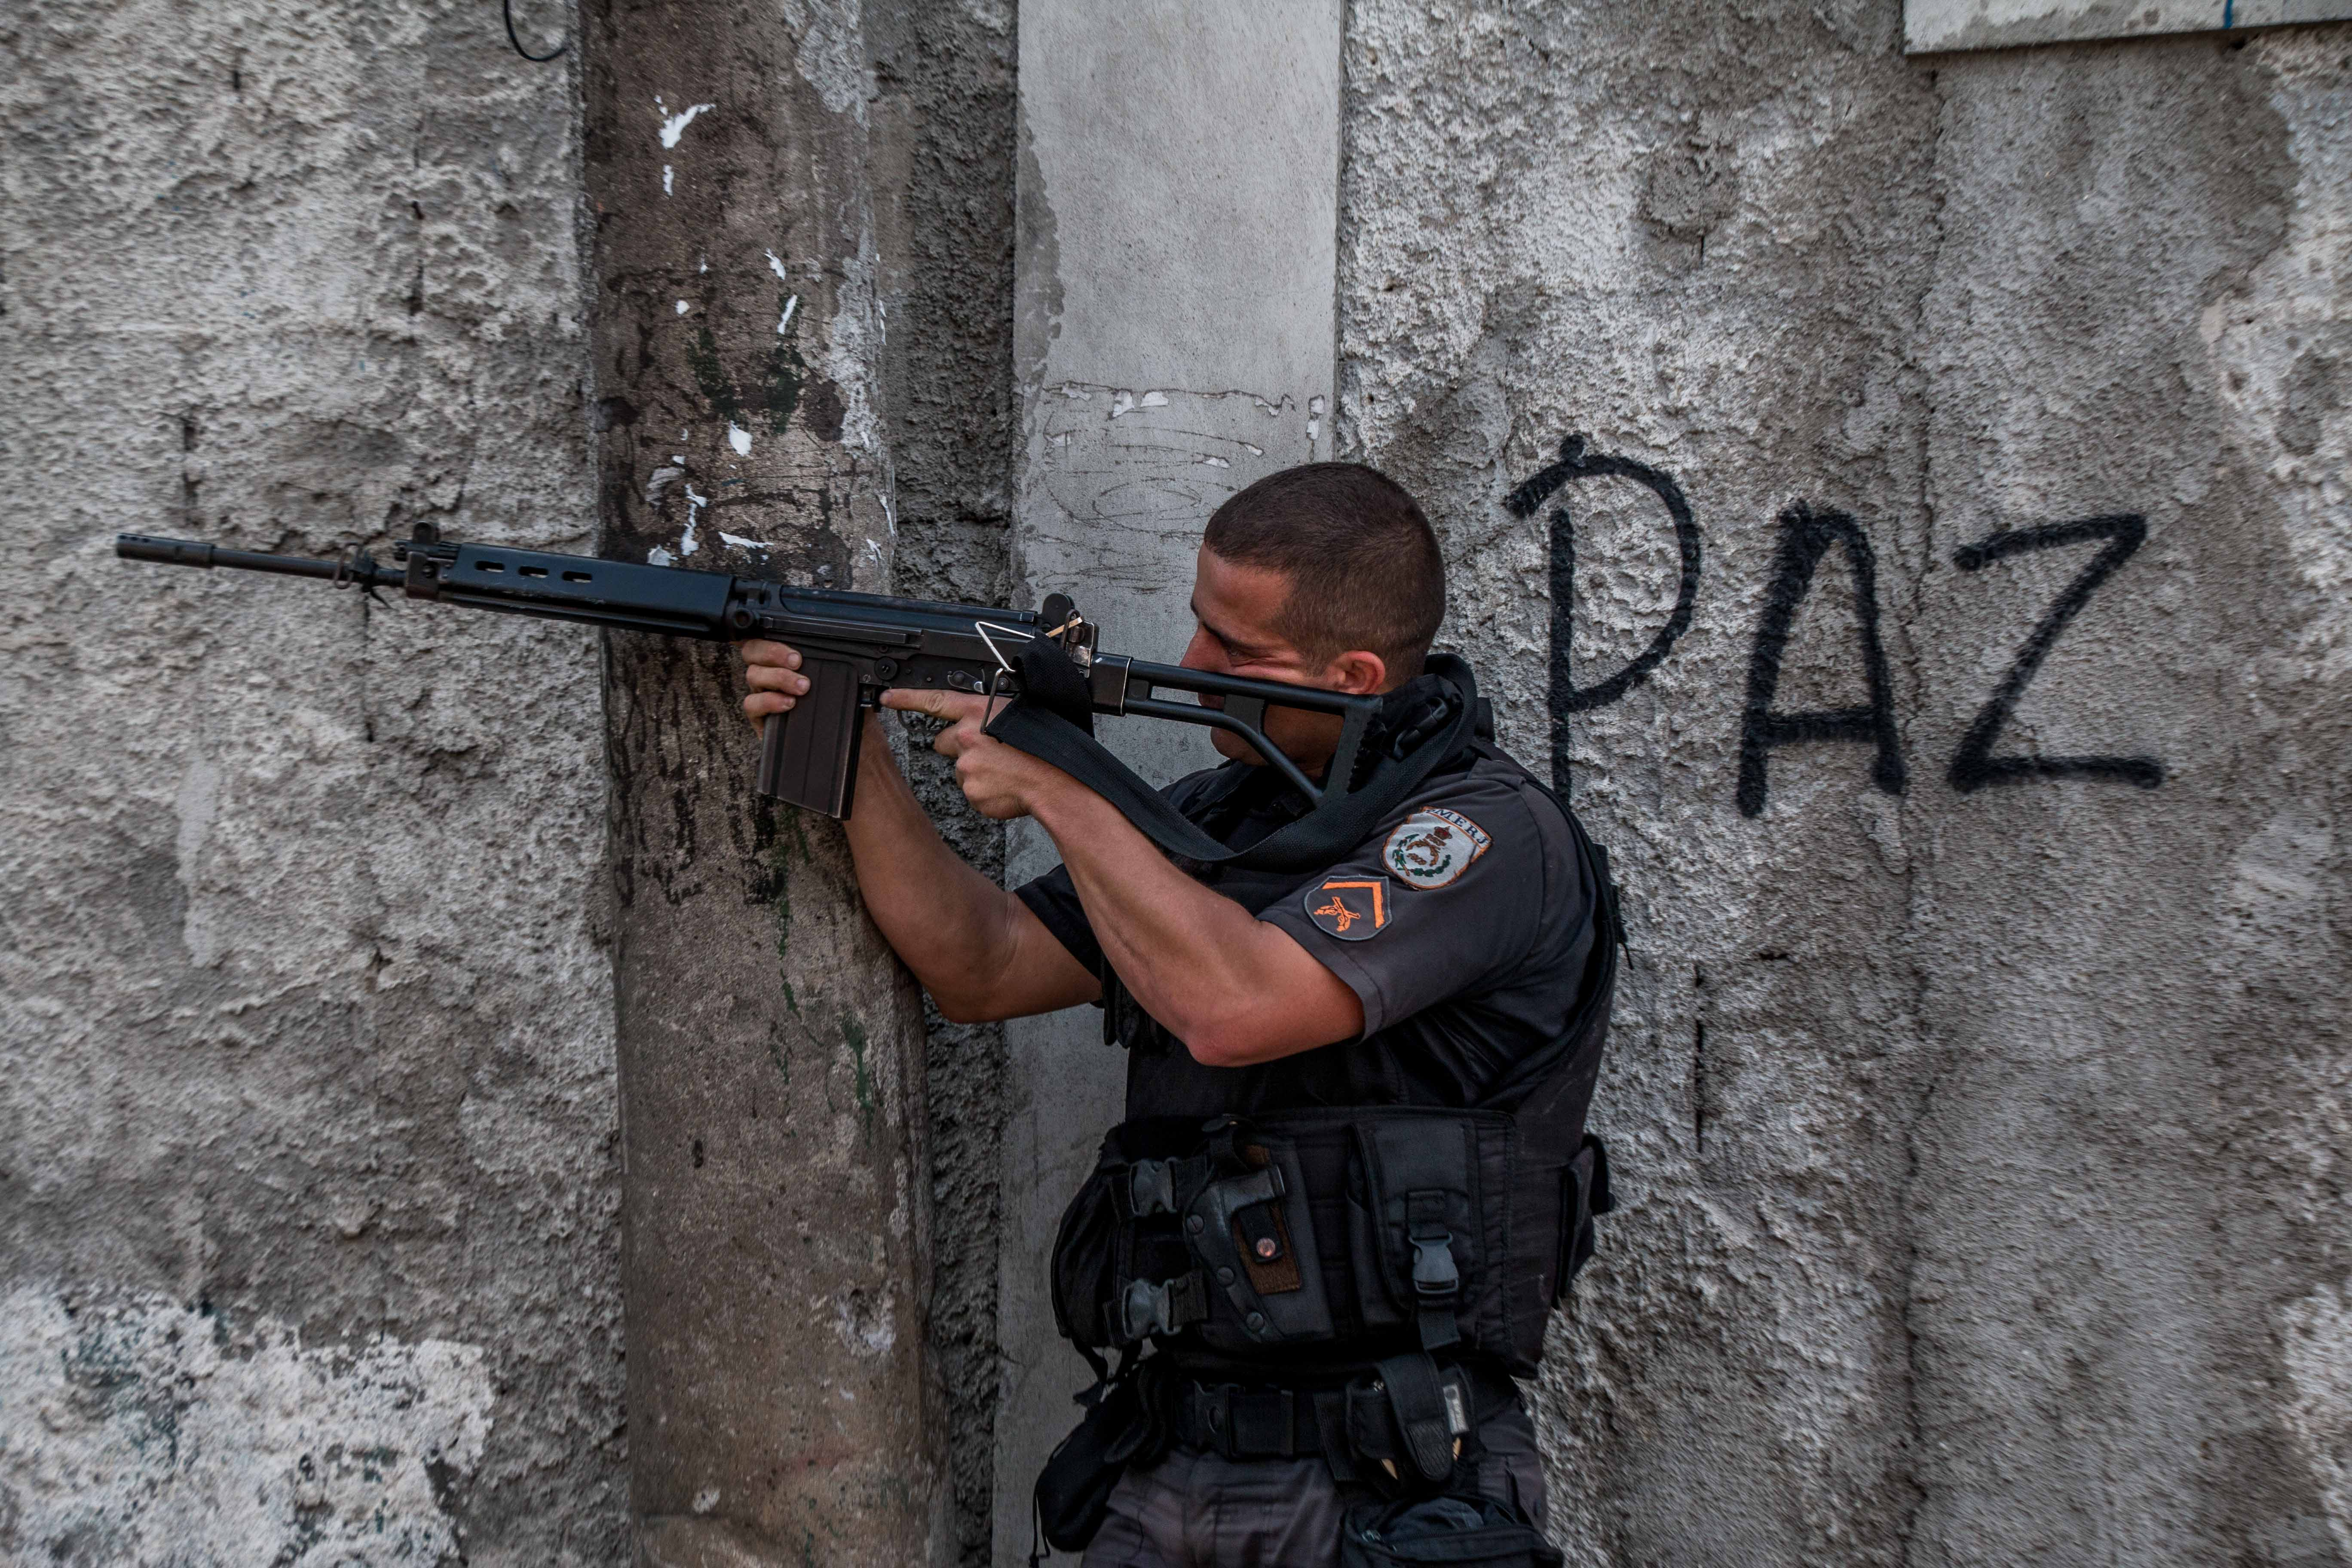 Foto: Renato Moura - Jornal Voz da comunidade